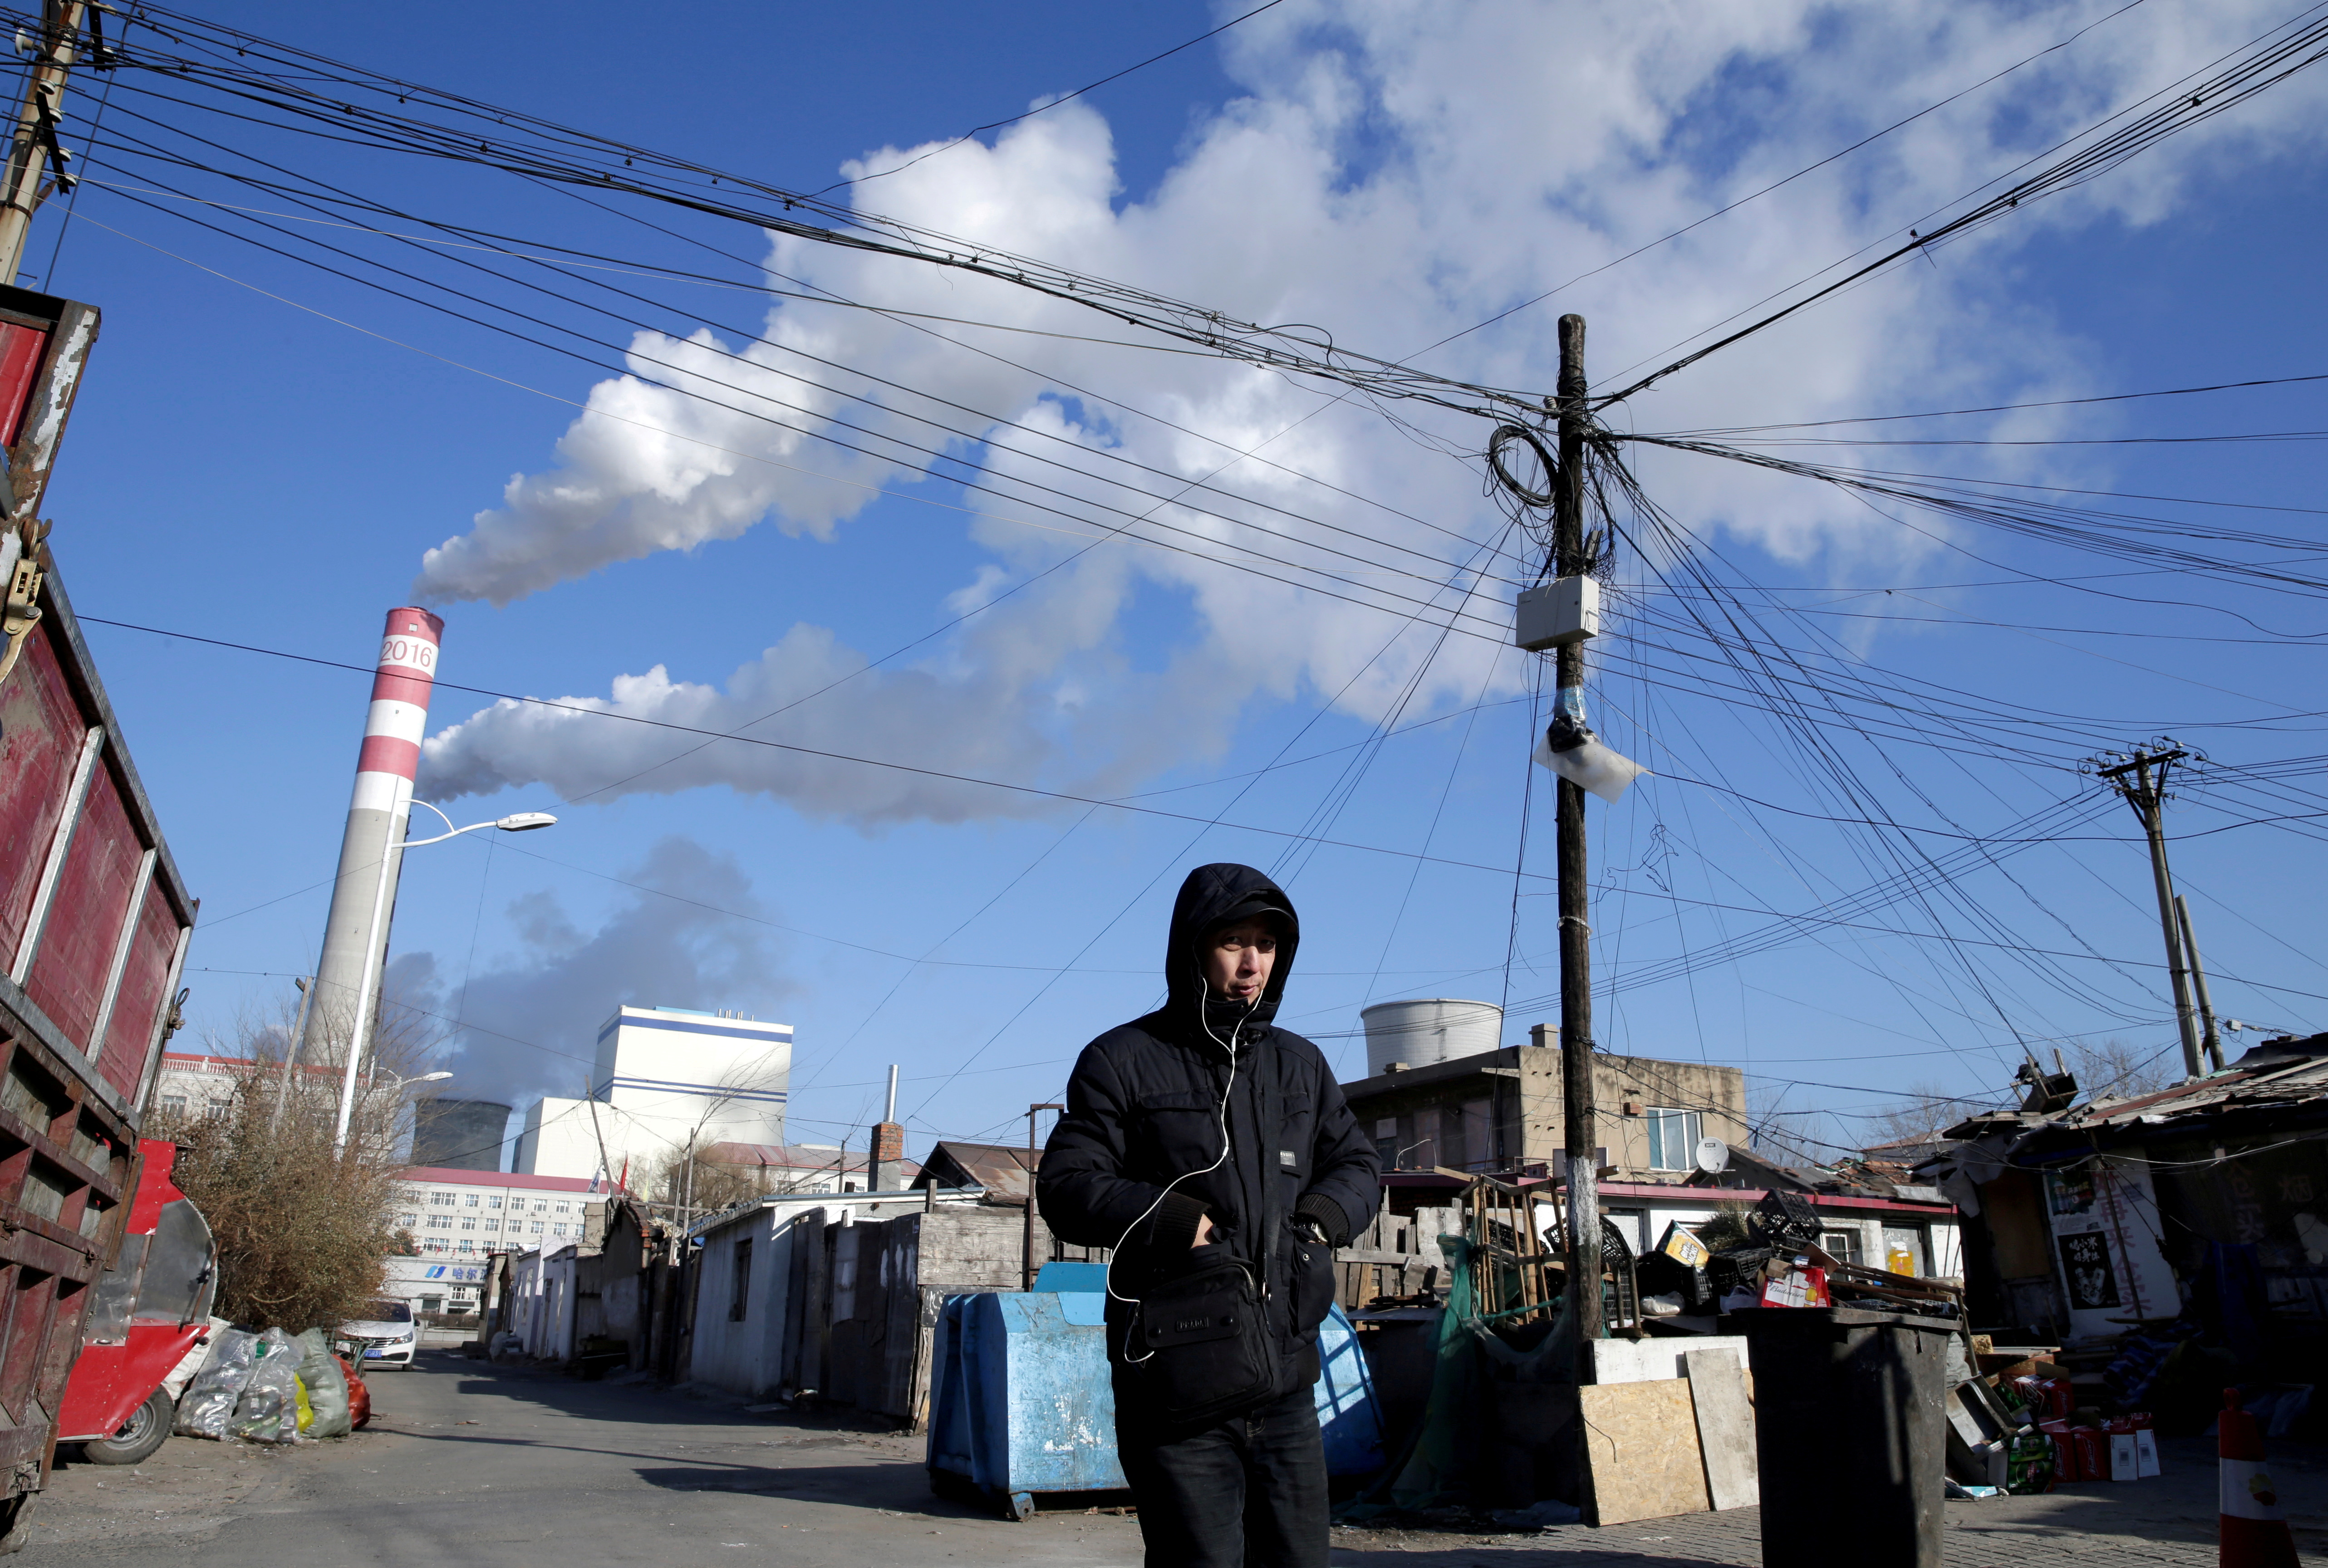 A man walks near a coal-fired power plant in Harbin, Heilongjiang province, China, November 27, 2019. REUTERS/Jason Lee/File Photo